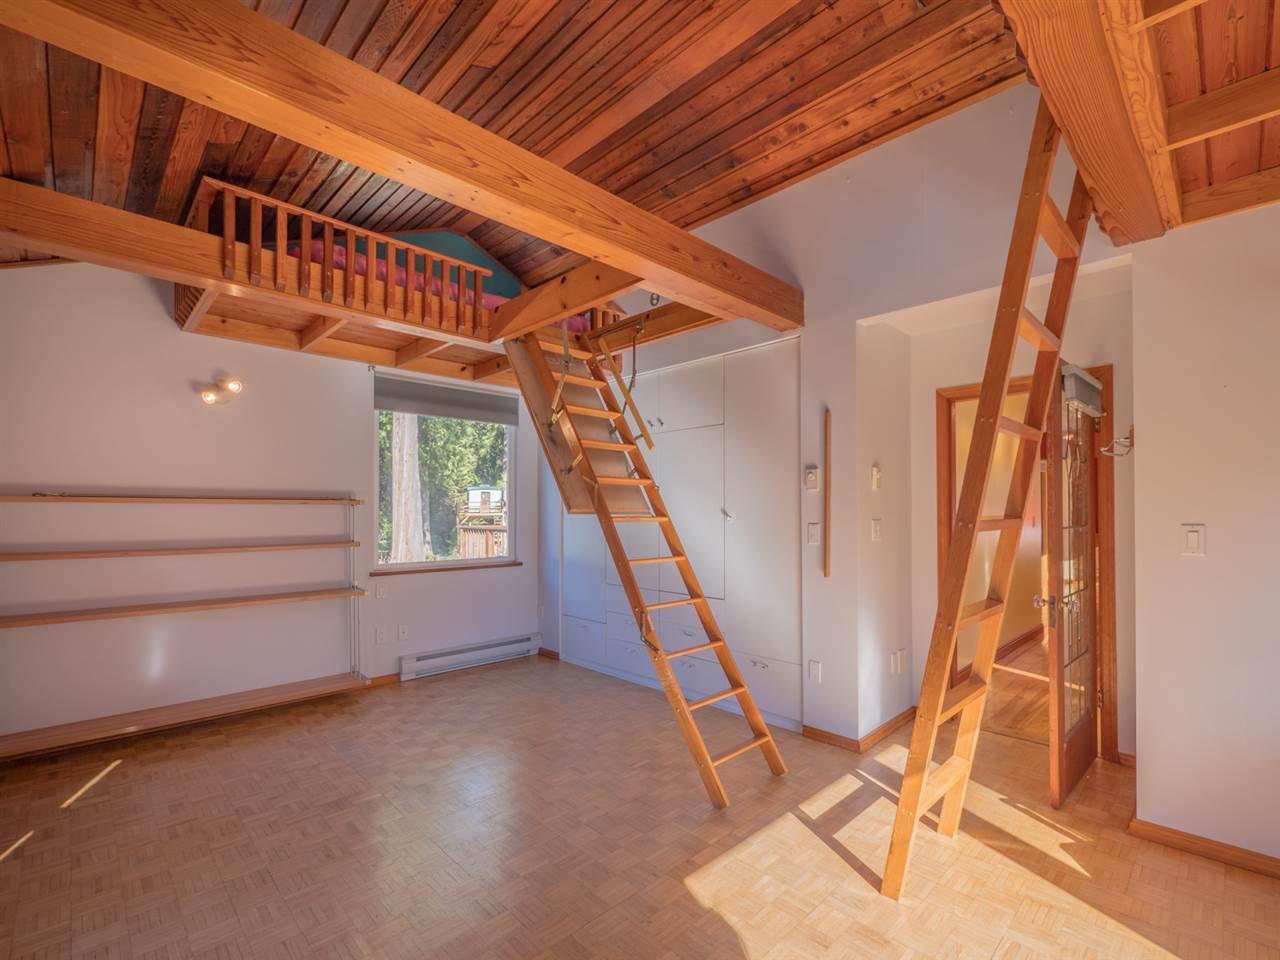 Photo 12: Photos: 3592 BEACH Avenue: Roberts Creek House for sale (Sunshine Coast)  : MLS®# R2244747